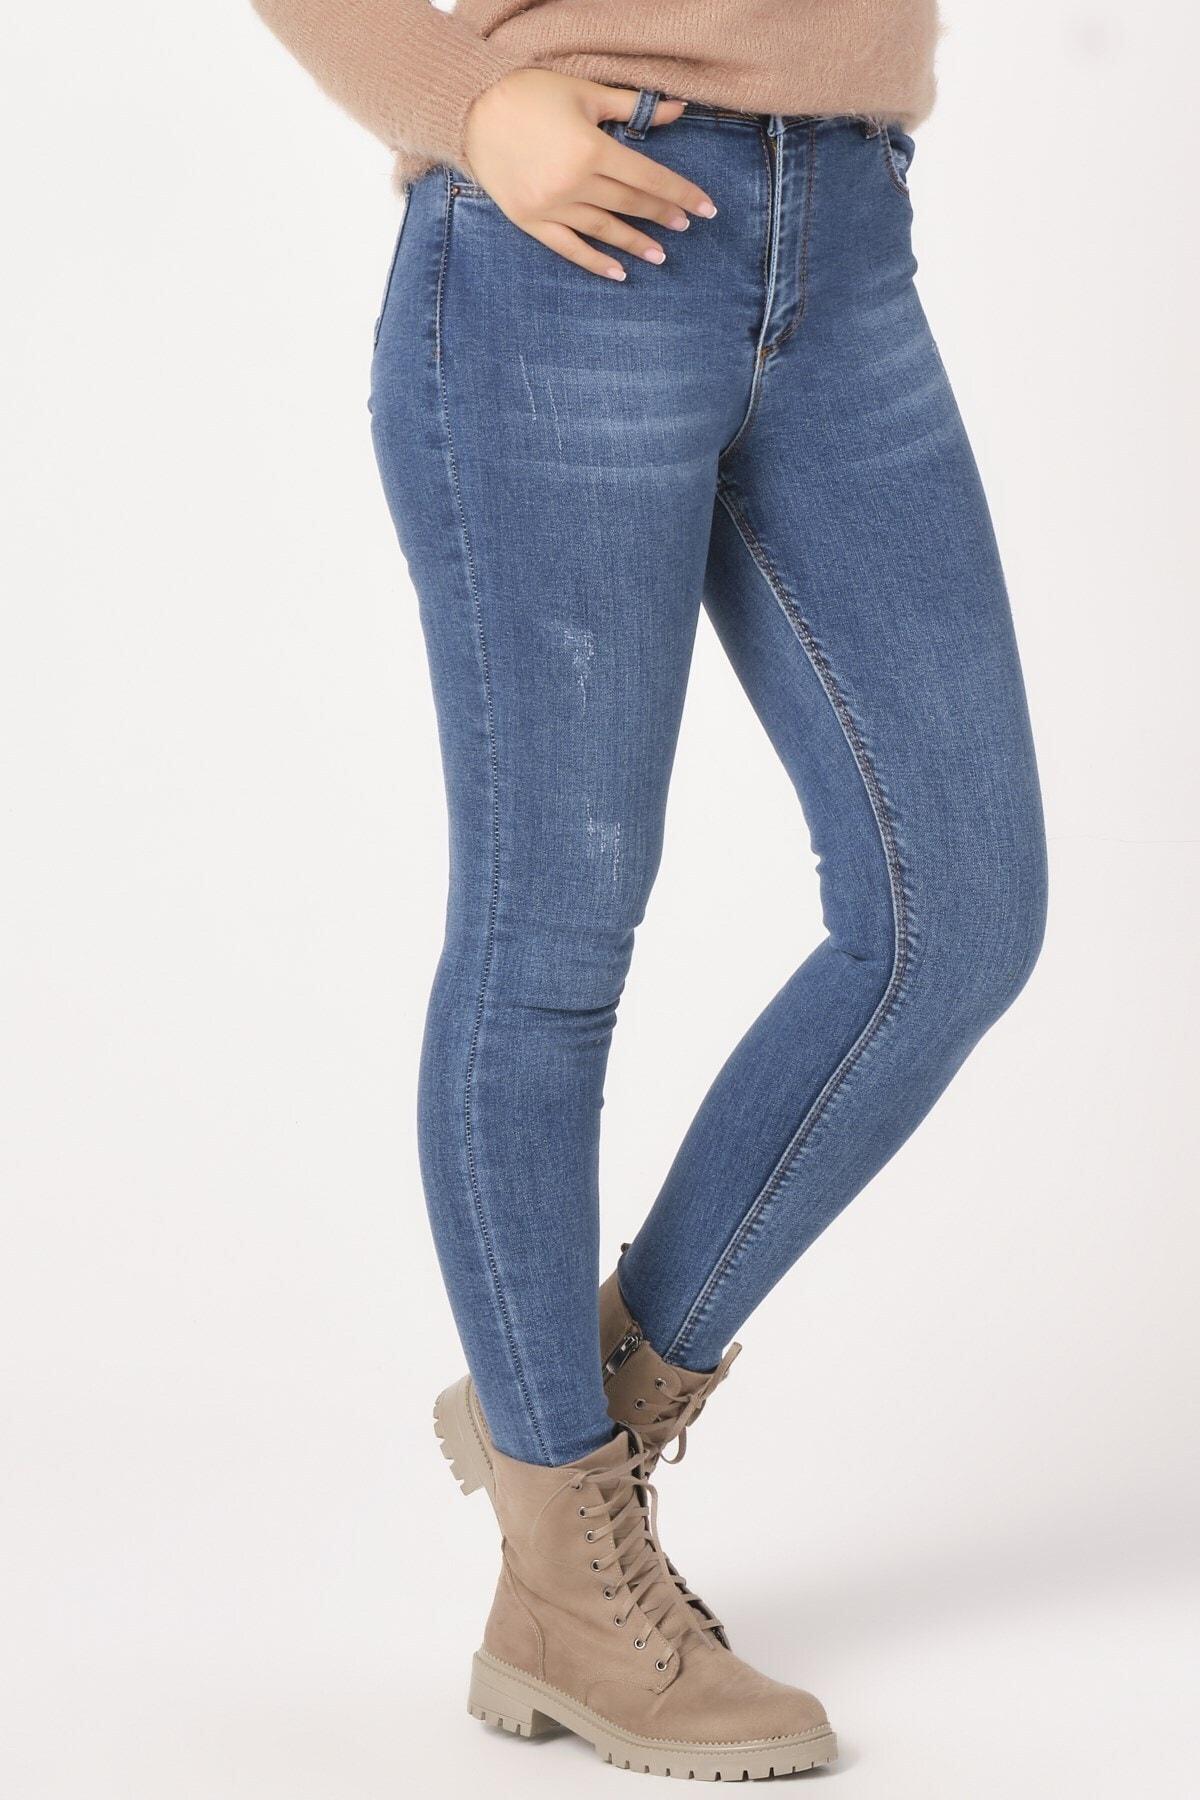 KETEEN Kadın Mavi Dar Paça Mira Bilek Kot Pantolon 2